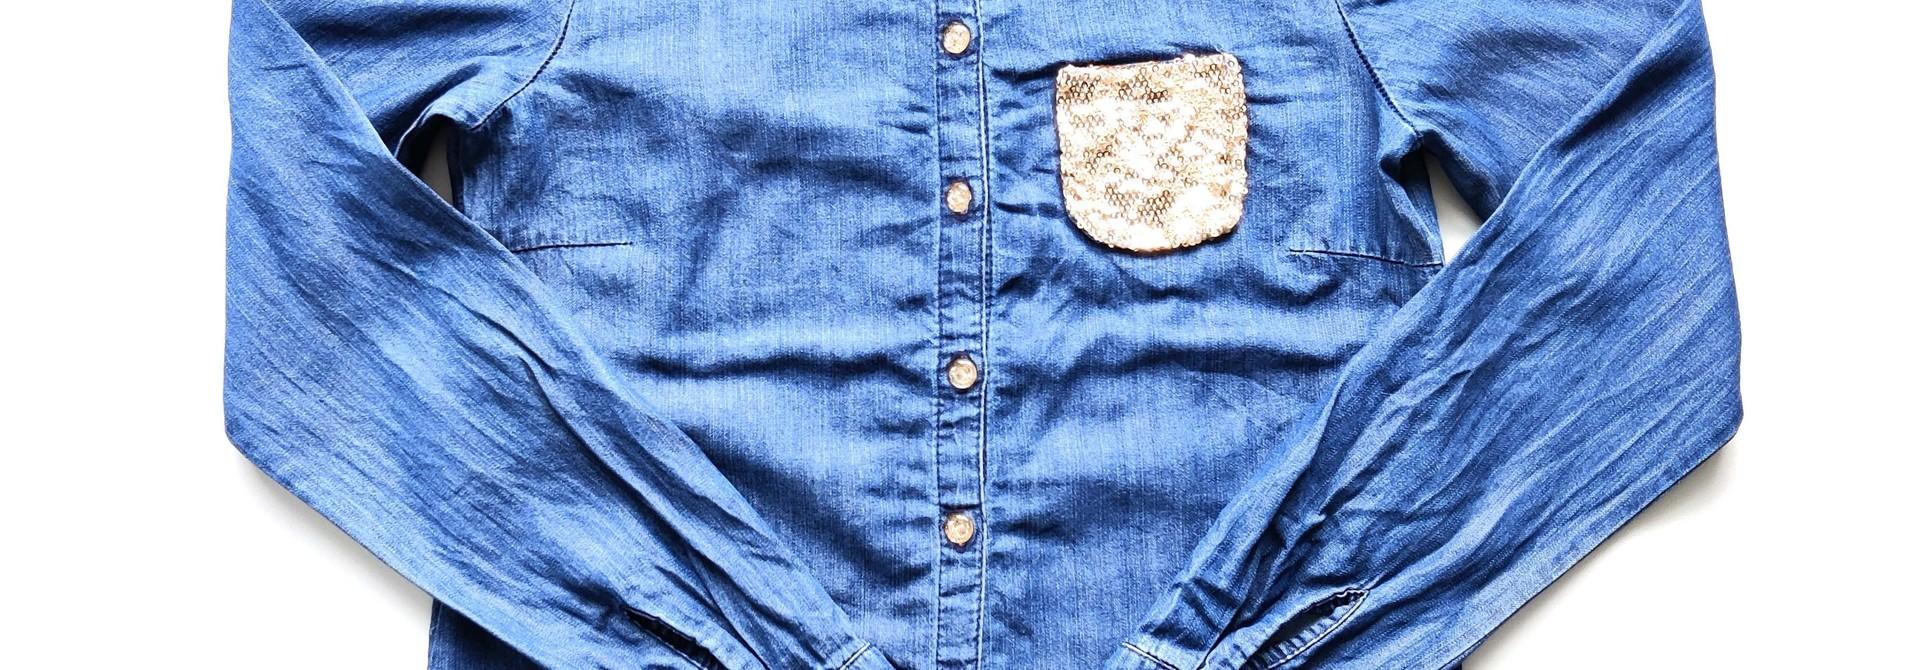 Jeans hemd Someone